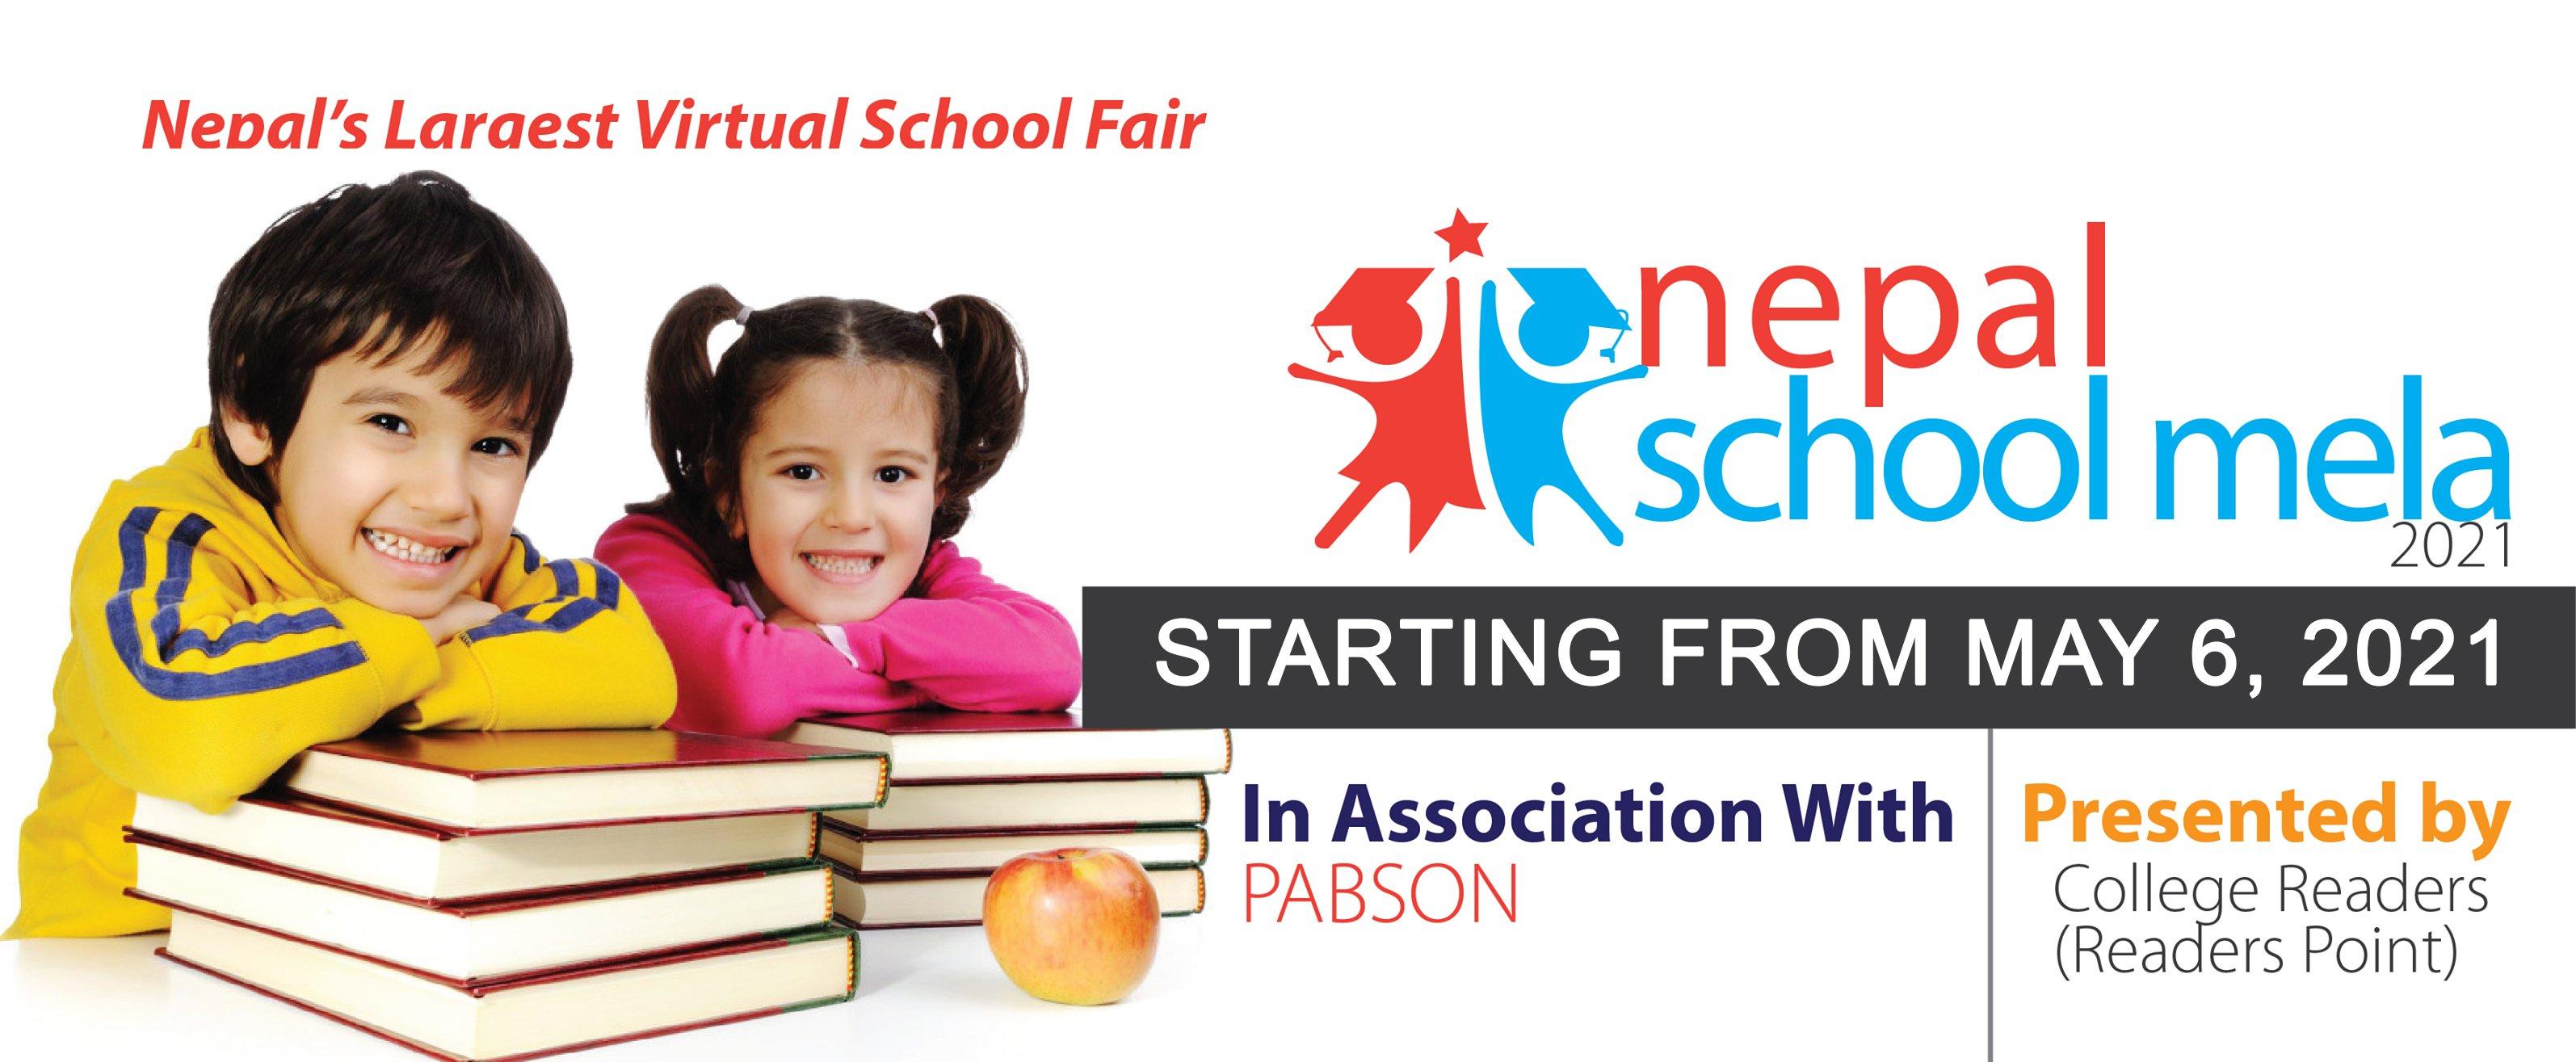 Nepal's first largest virtual Edu Fair-NEPAL SCHOOL MELA-2021 to kick-off today